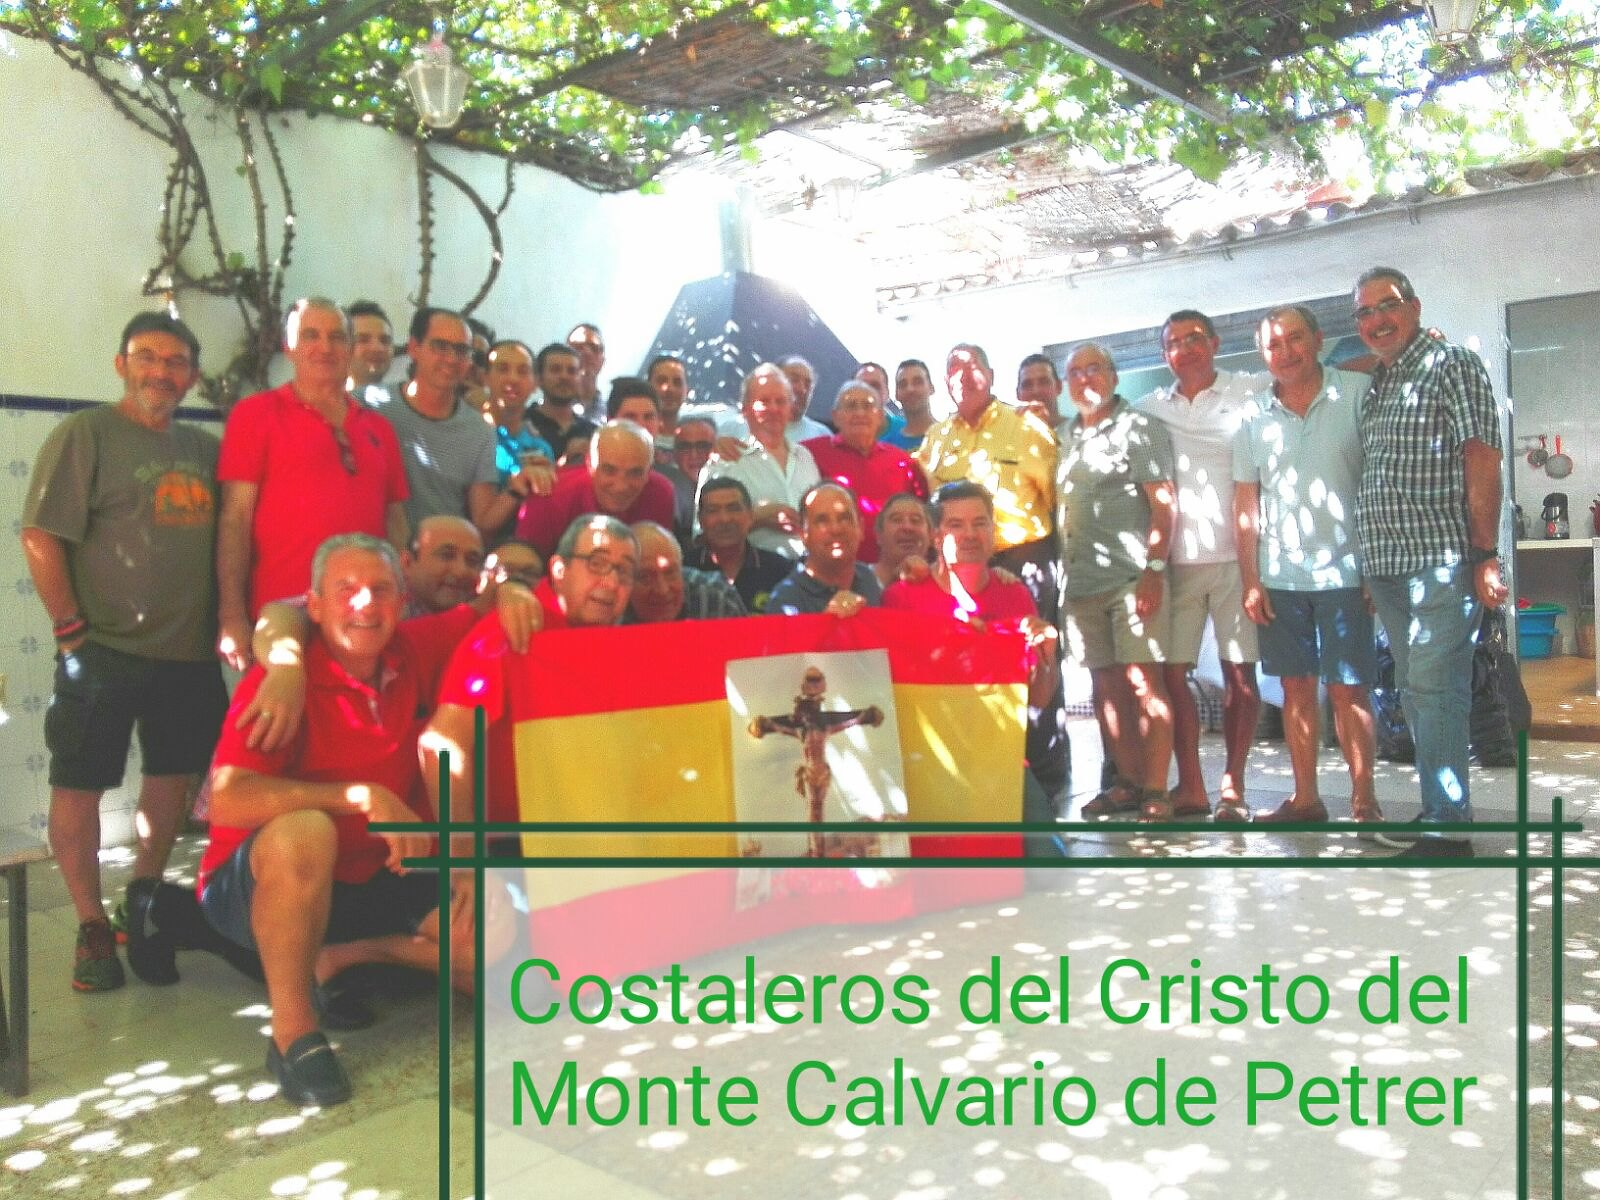 (2017-06-17) 2ºAlmuerzo costalero (Javier Romero Ripoll) (27)